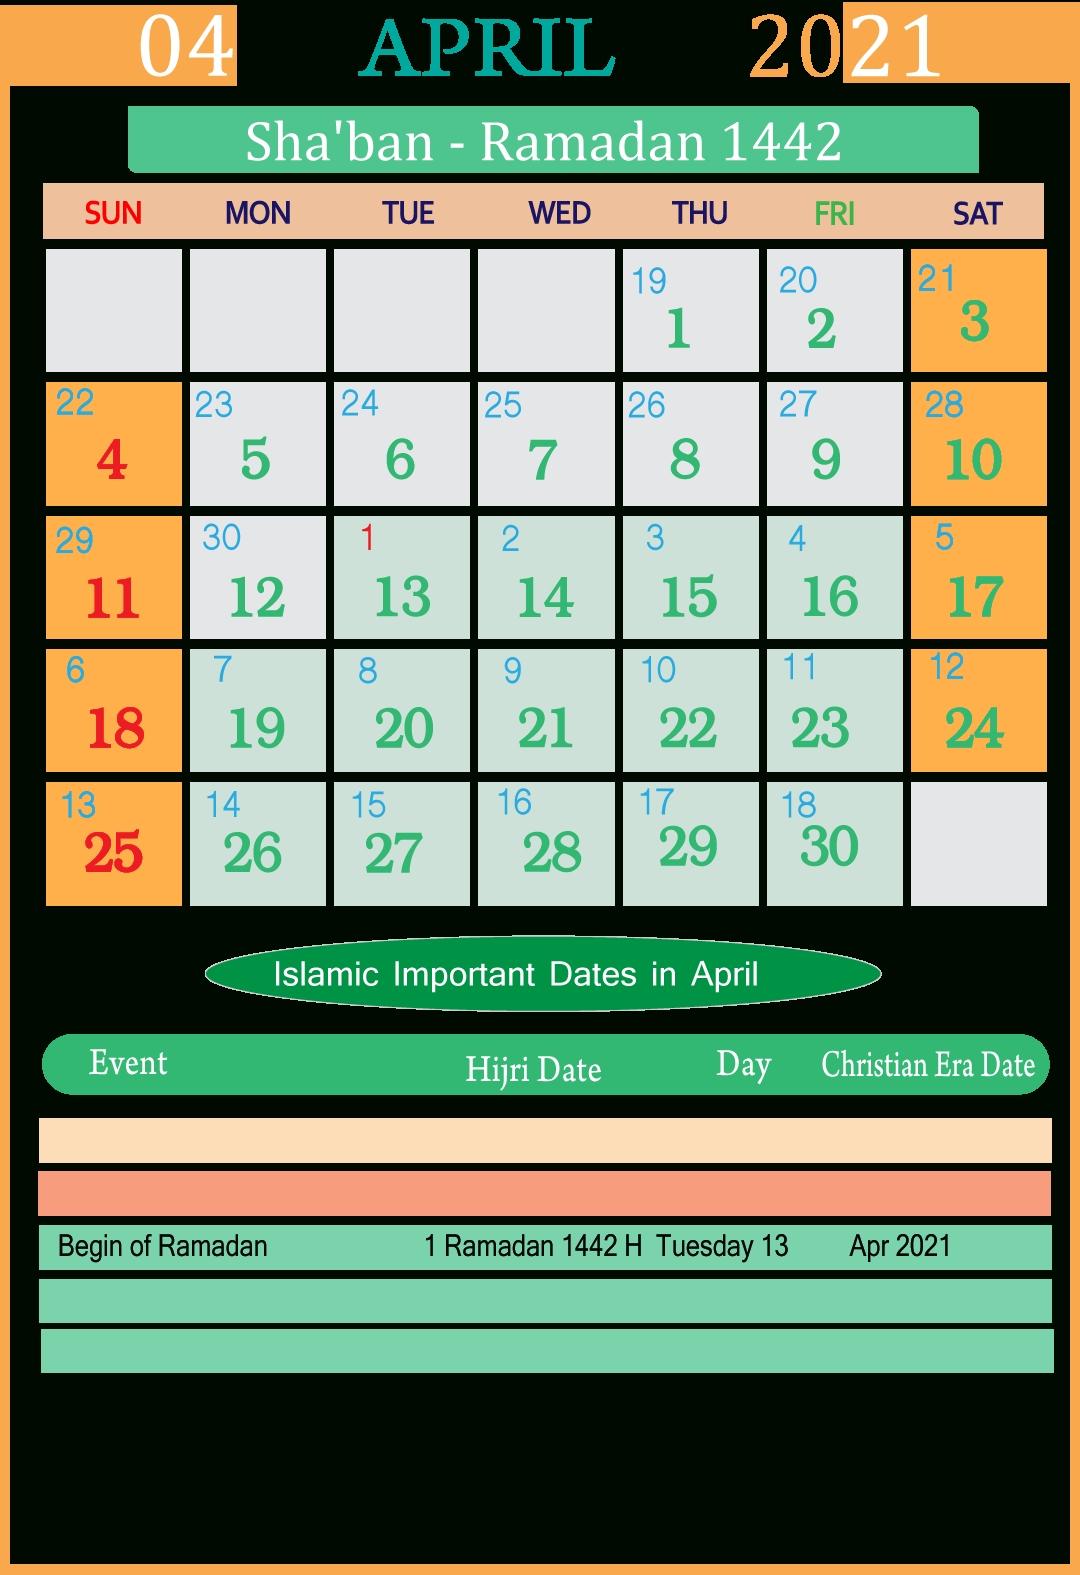 Gail Alam: Calendar For 2021 With Holidays And Ramadan